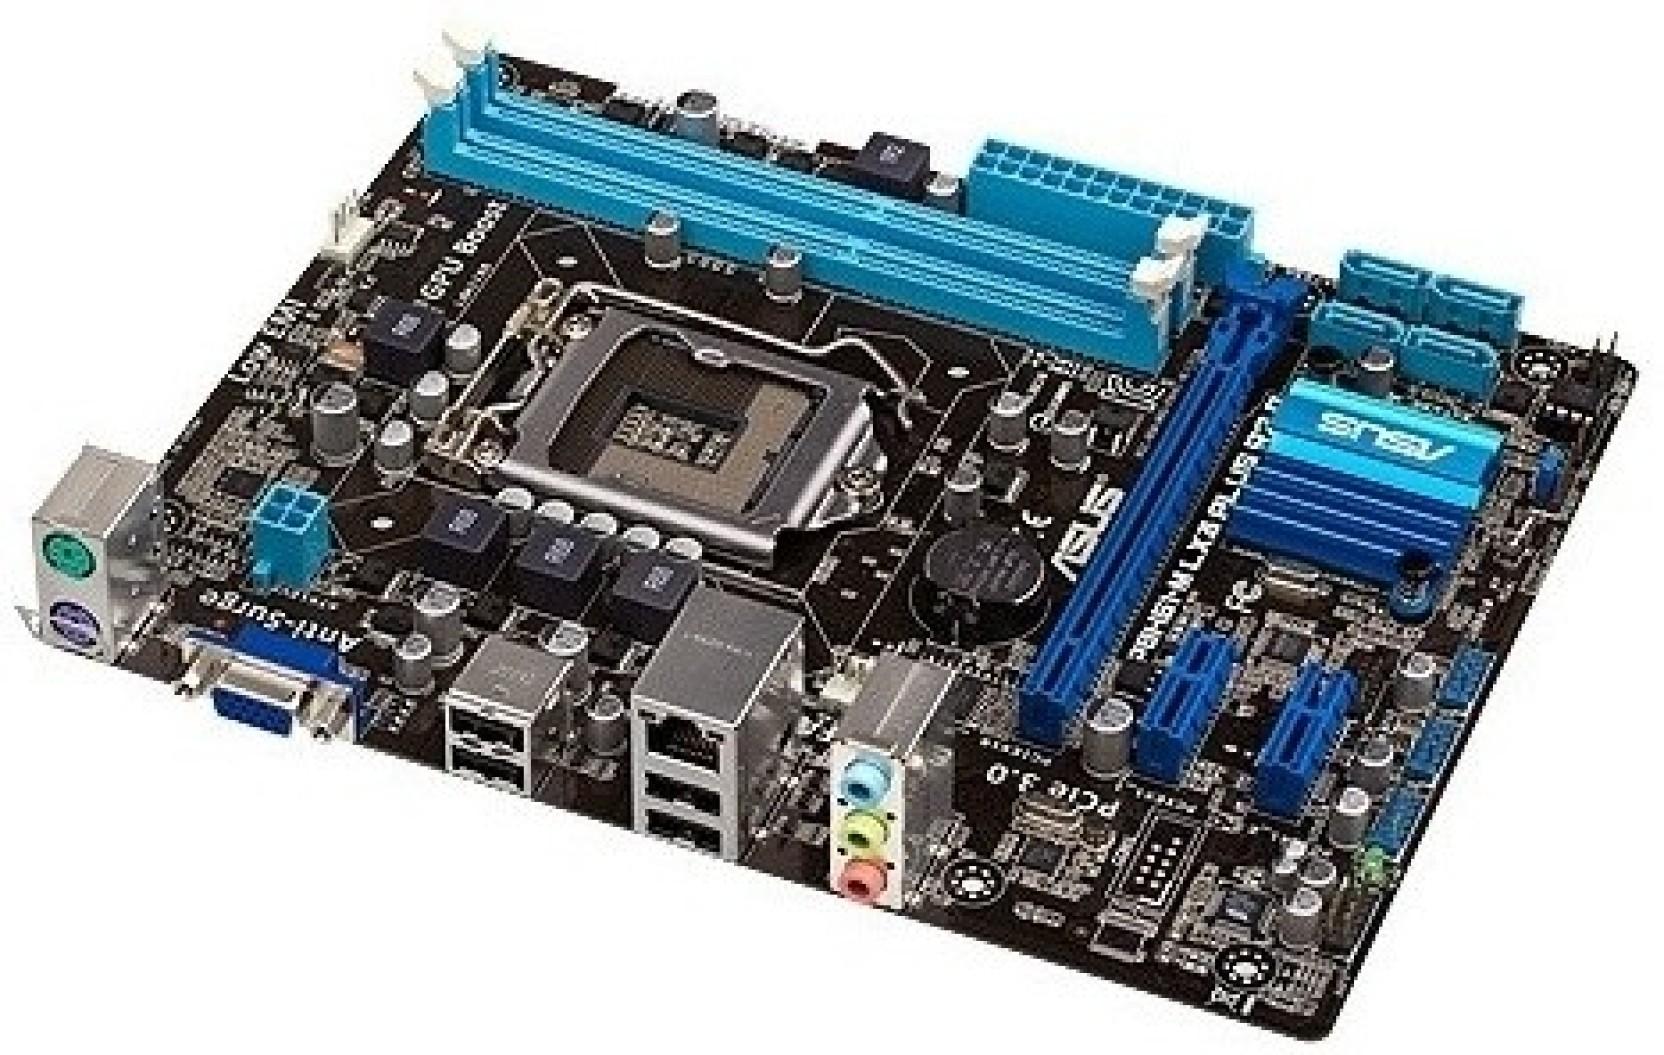 Asus P8h61-m Lx Motherboard